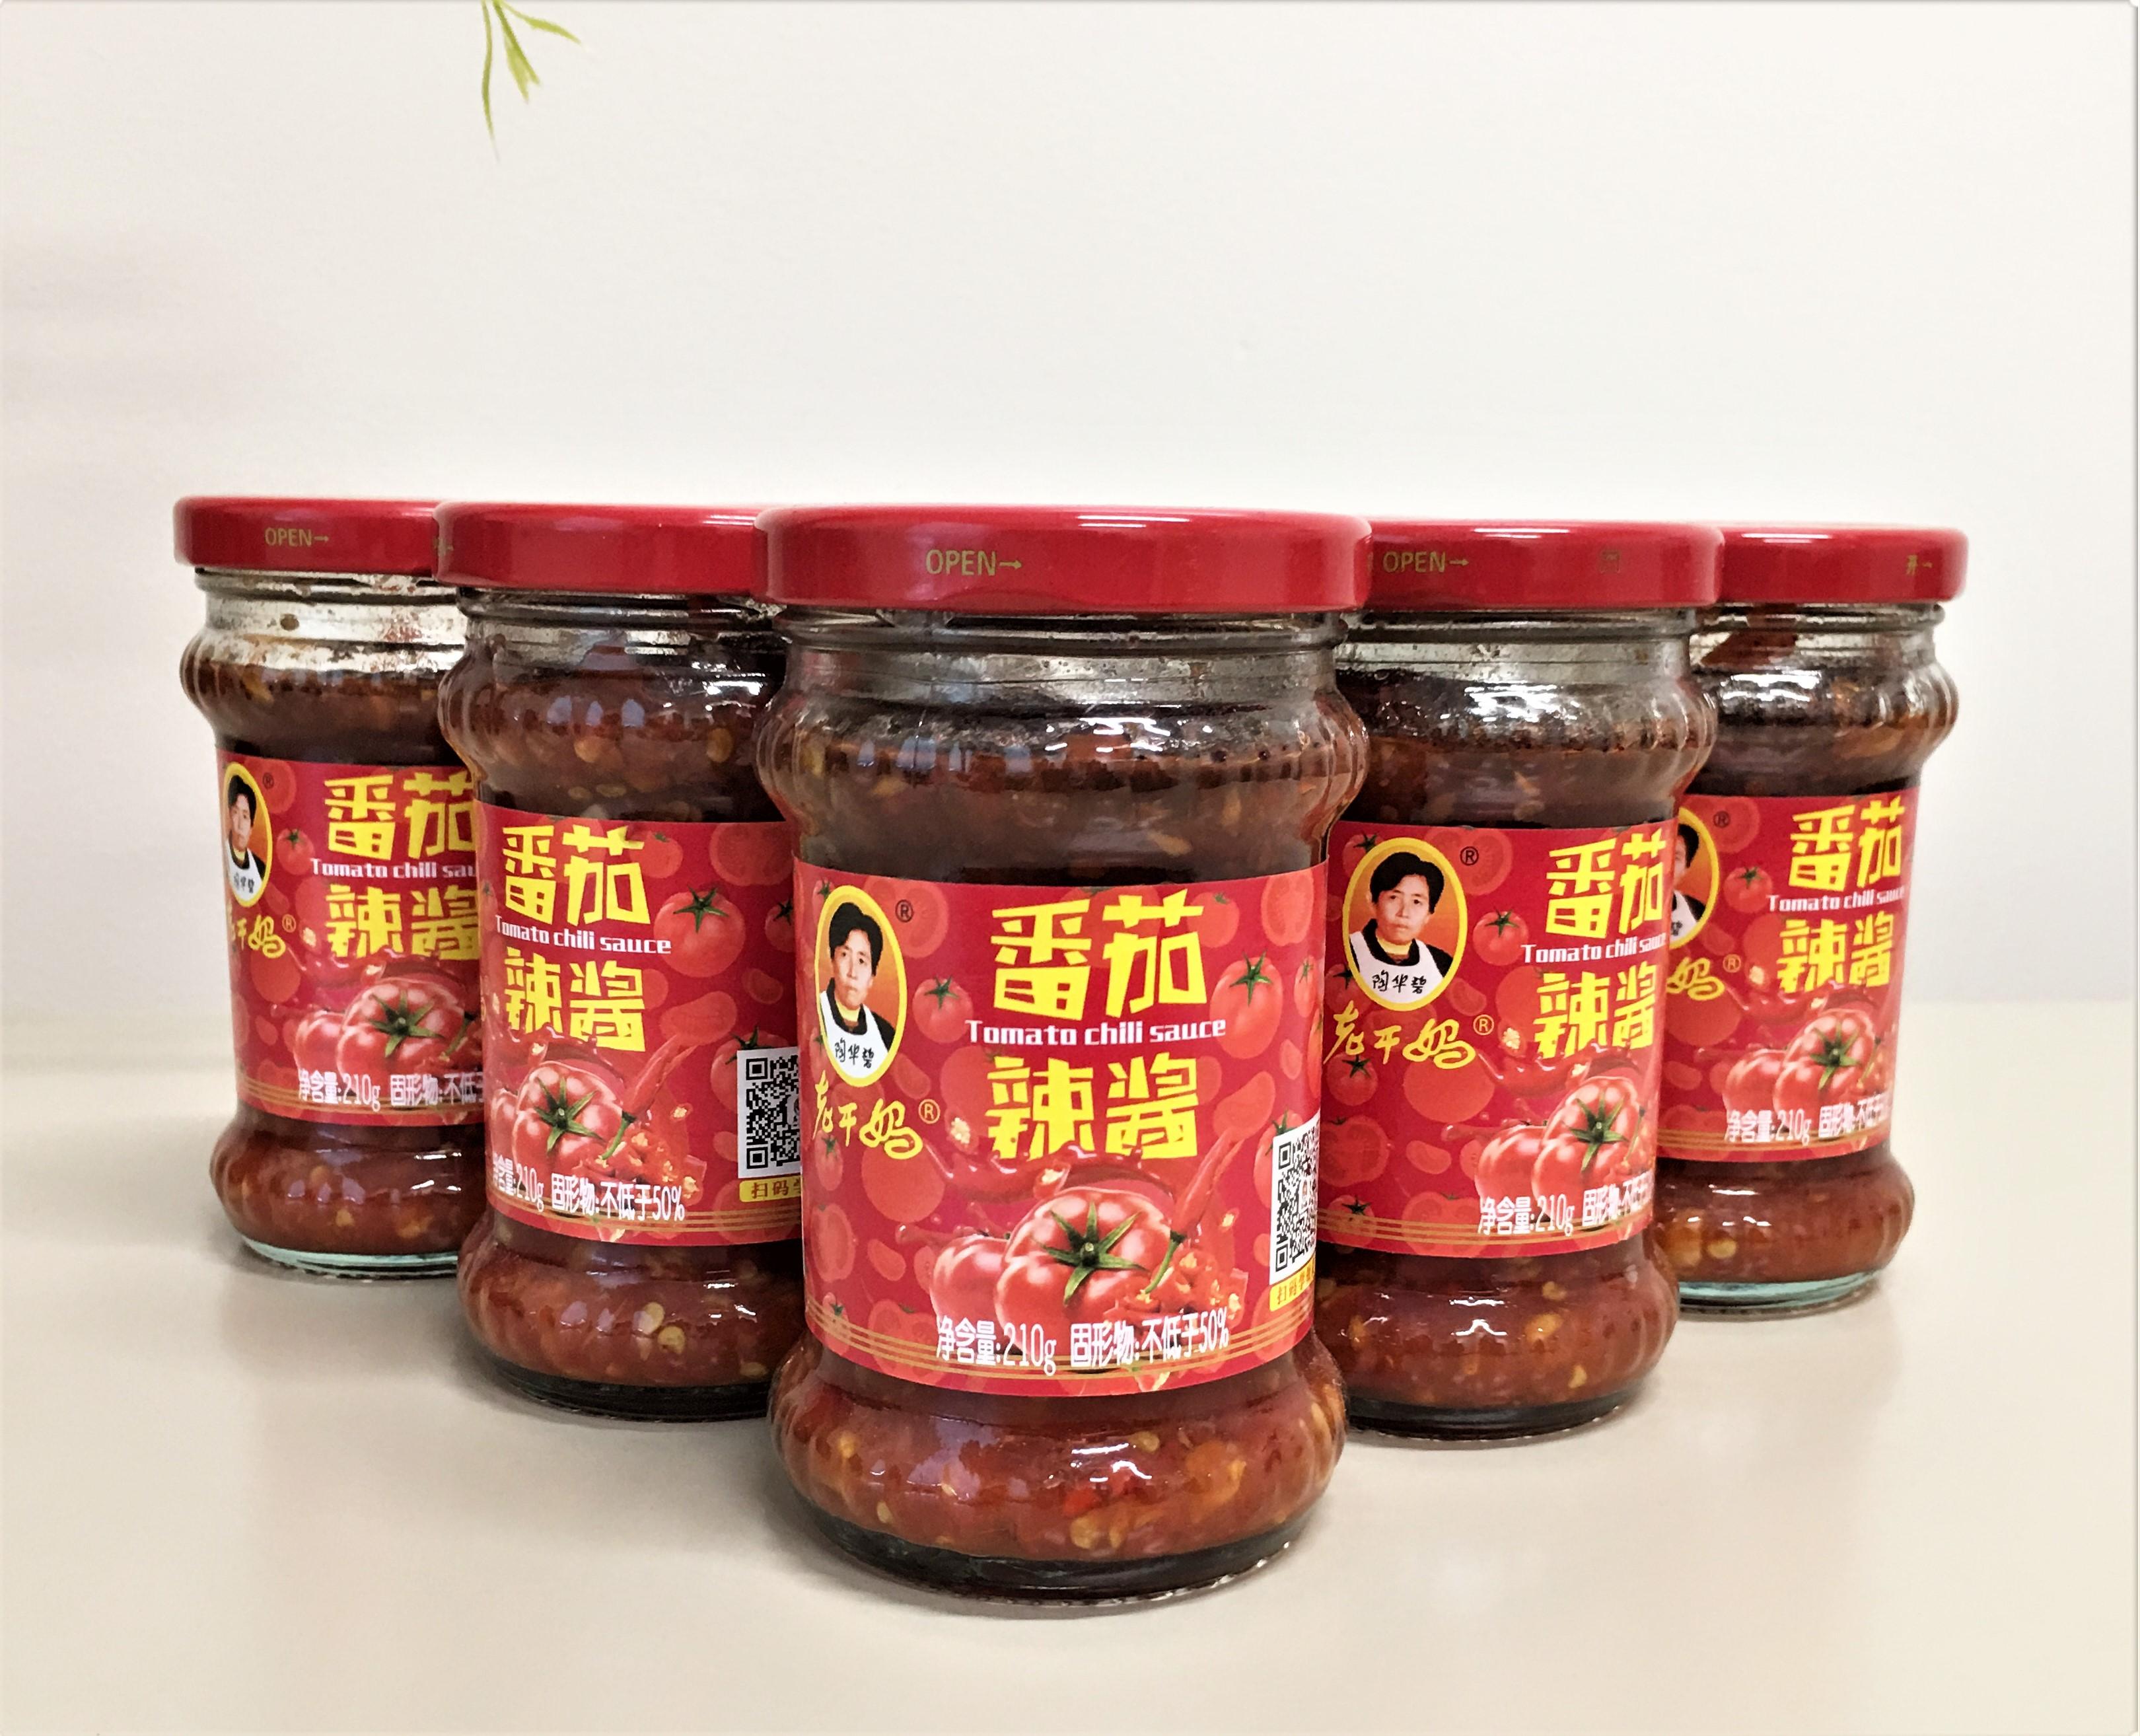 LGM Tomato Chili Sauce